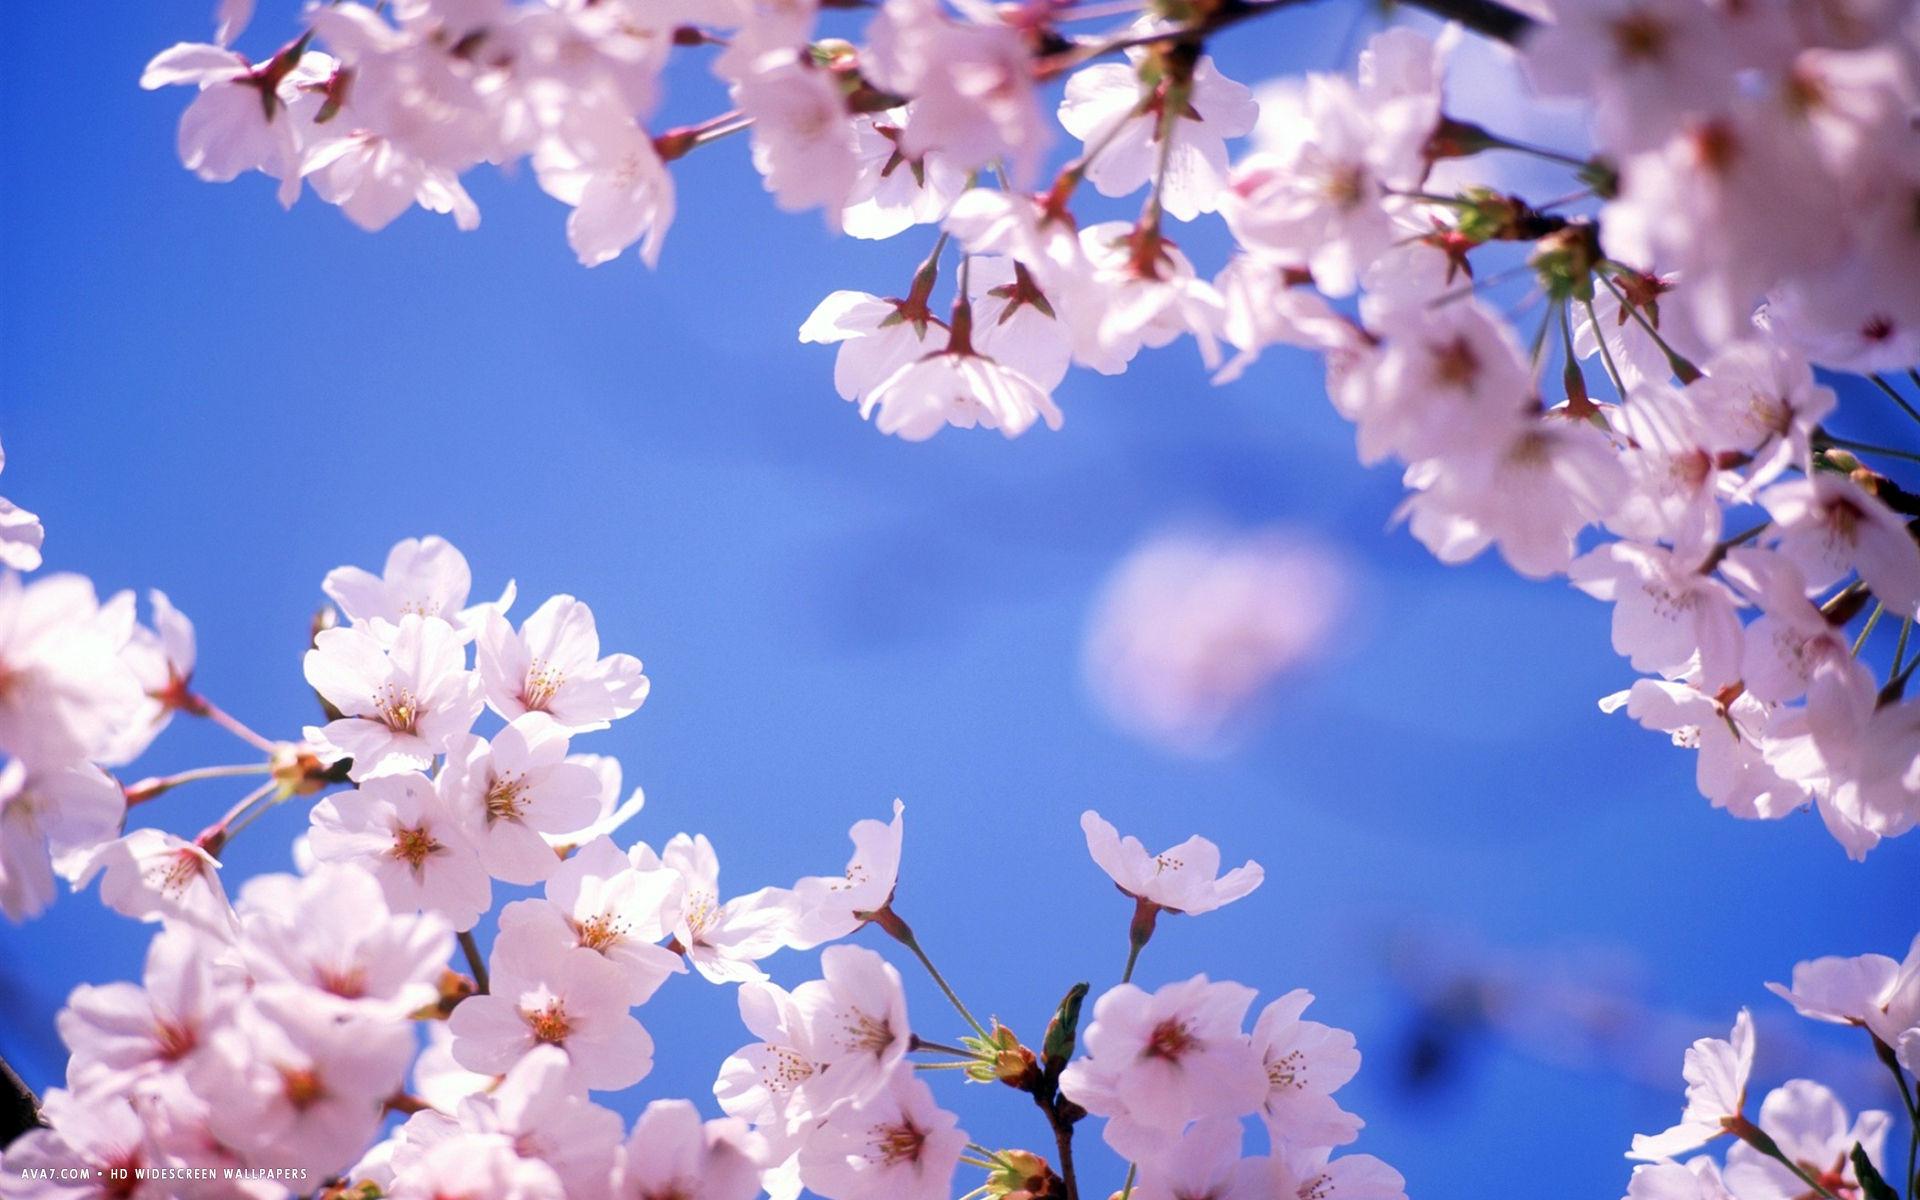 Free Download Cherry Blossom Flower Hd Widescreen Wallpaper Flowers Backgrounds 1920x1200 For Your Desktop Mobile Tablet Explore 39 Flower Desktop Wallpaper Widescreen Widescreen Flower Garden Wallpapers Hd Flower Desktop